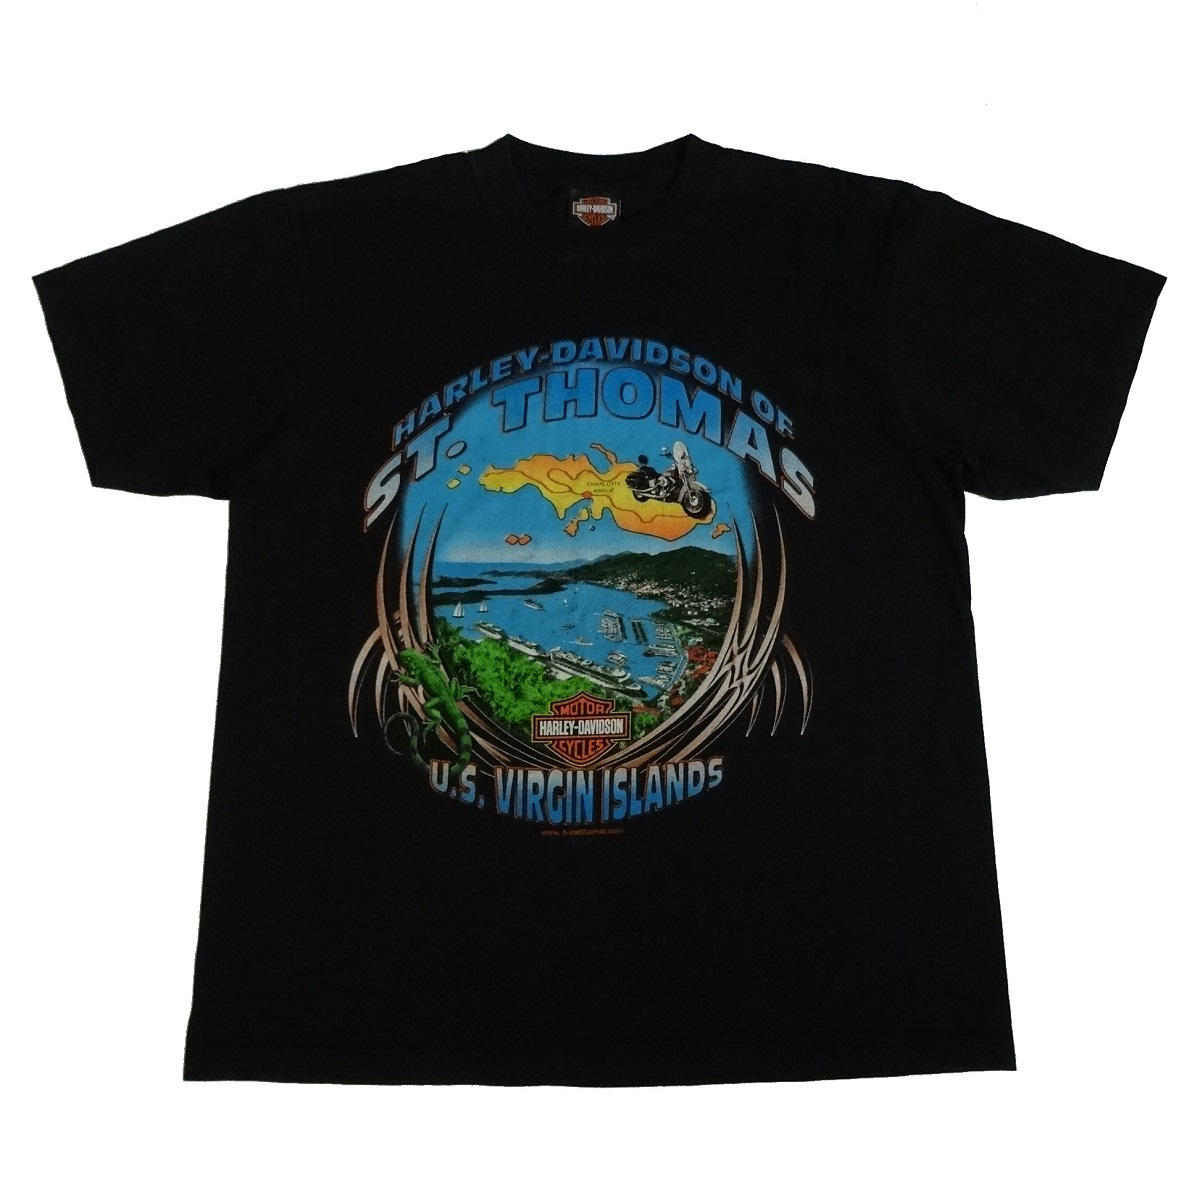 st thomas virgin islands harley davidson t shirt front